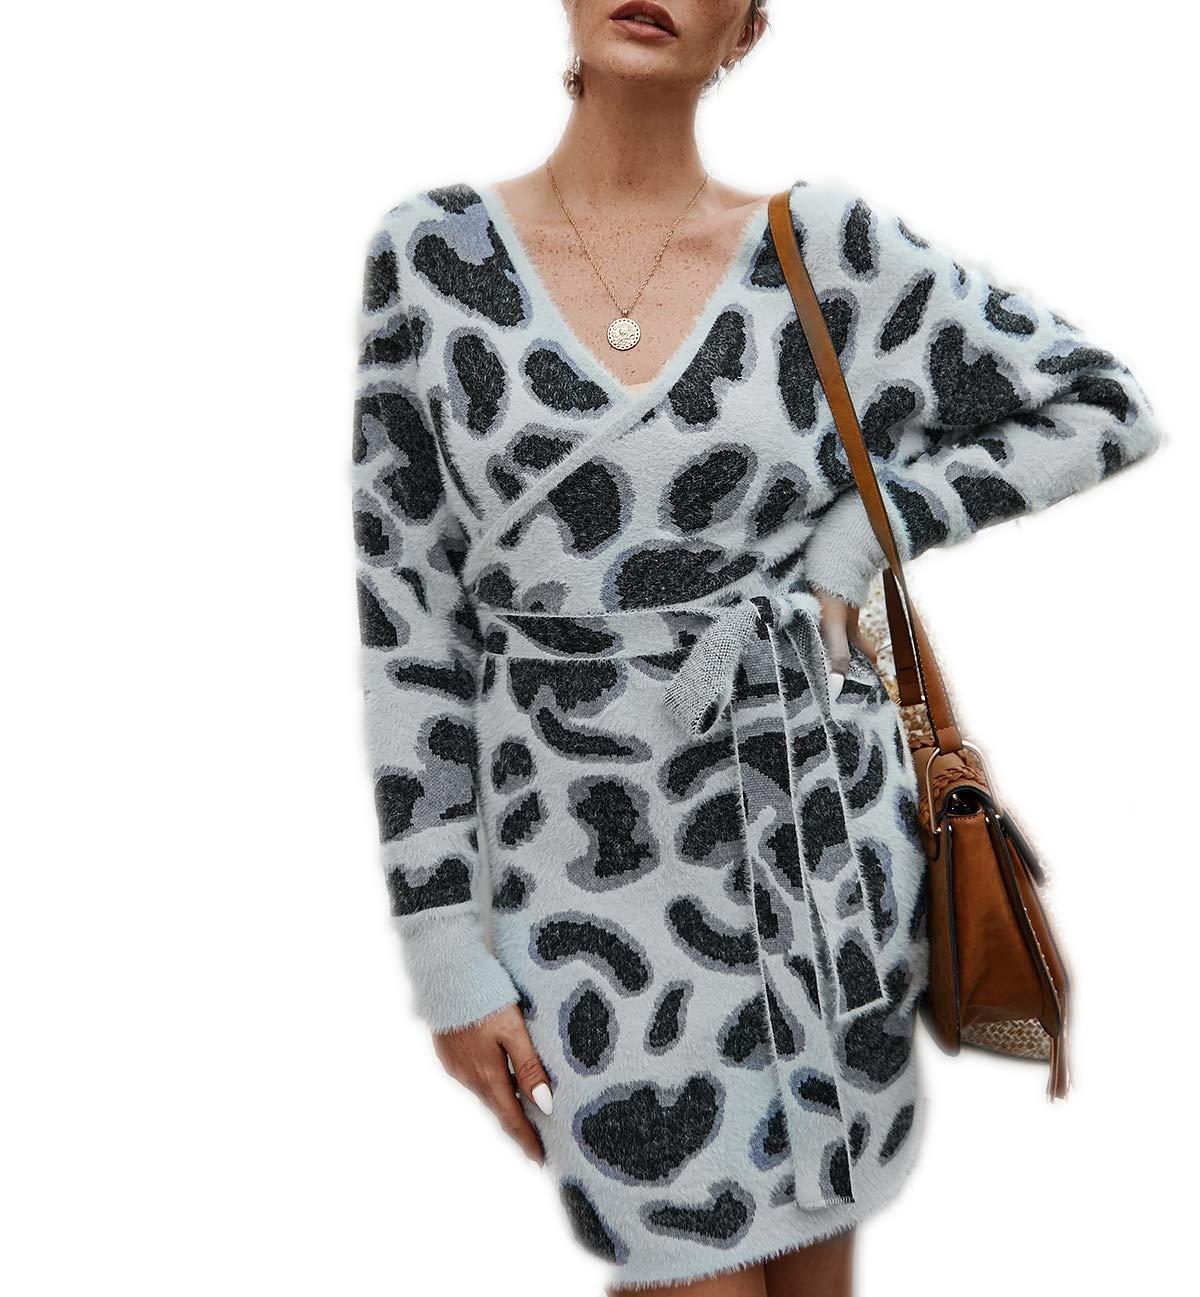 Women's Casual Knit Sweater Wrap Dress,Long Bat Wing Sleeve Leopard Print V Neck Backless Slim Fit Pencil Dresses with Belt Gray by KINGLEN Womens Dress